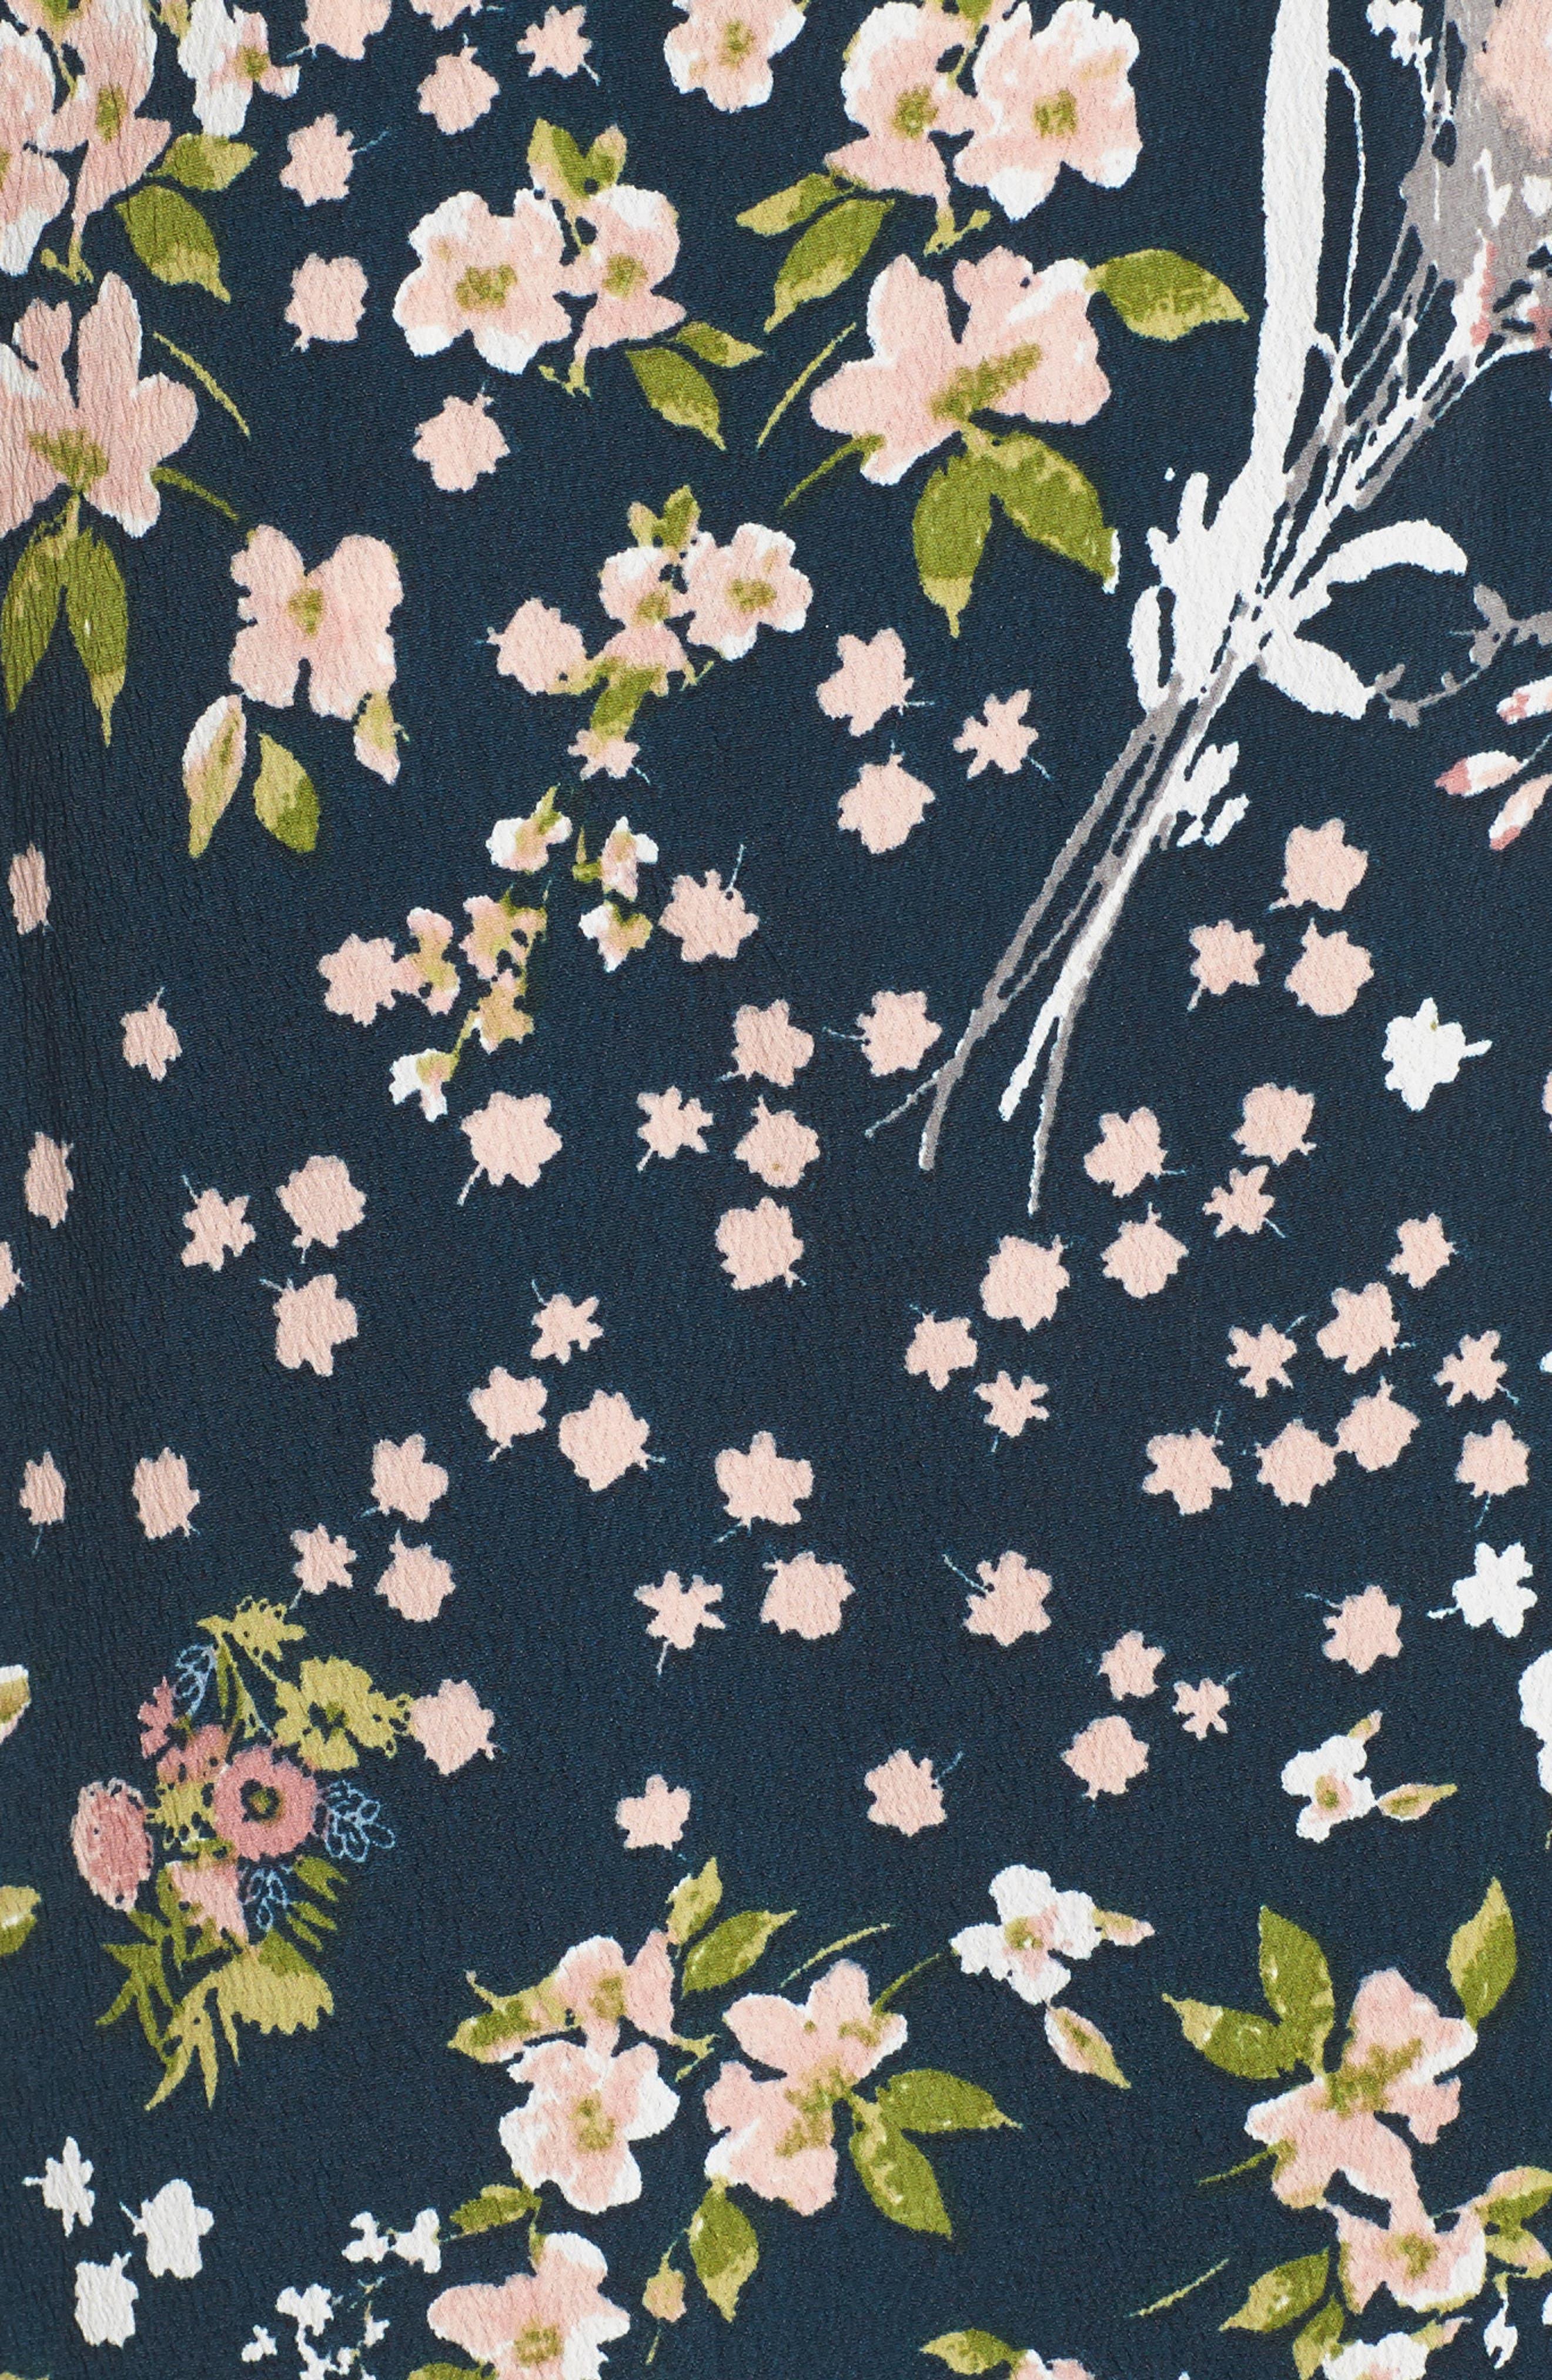 Moody Floral Print Maxi Romper,                             Alternate thumbnail 5, color,